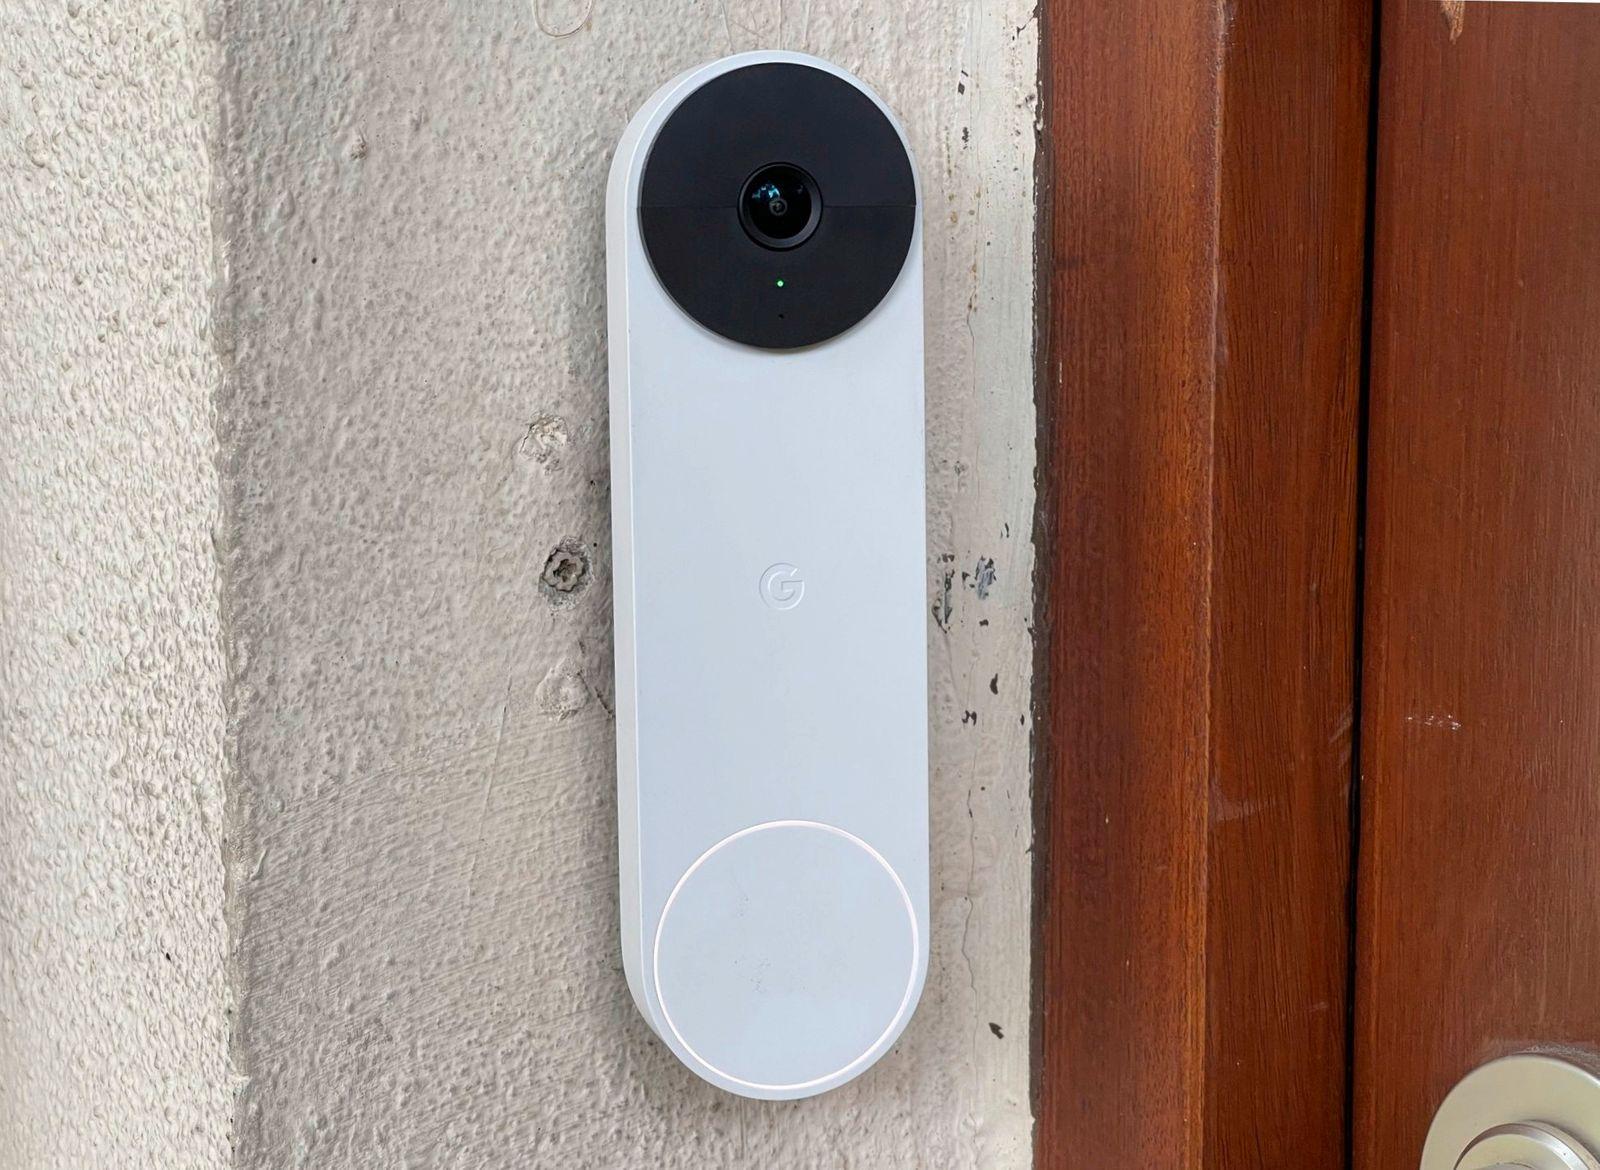 Google Nest Can/Doorbell